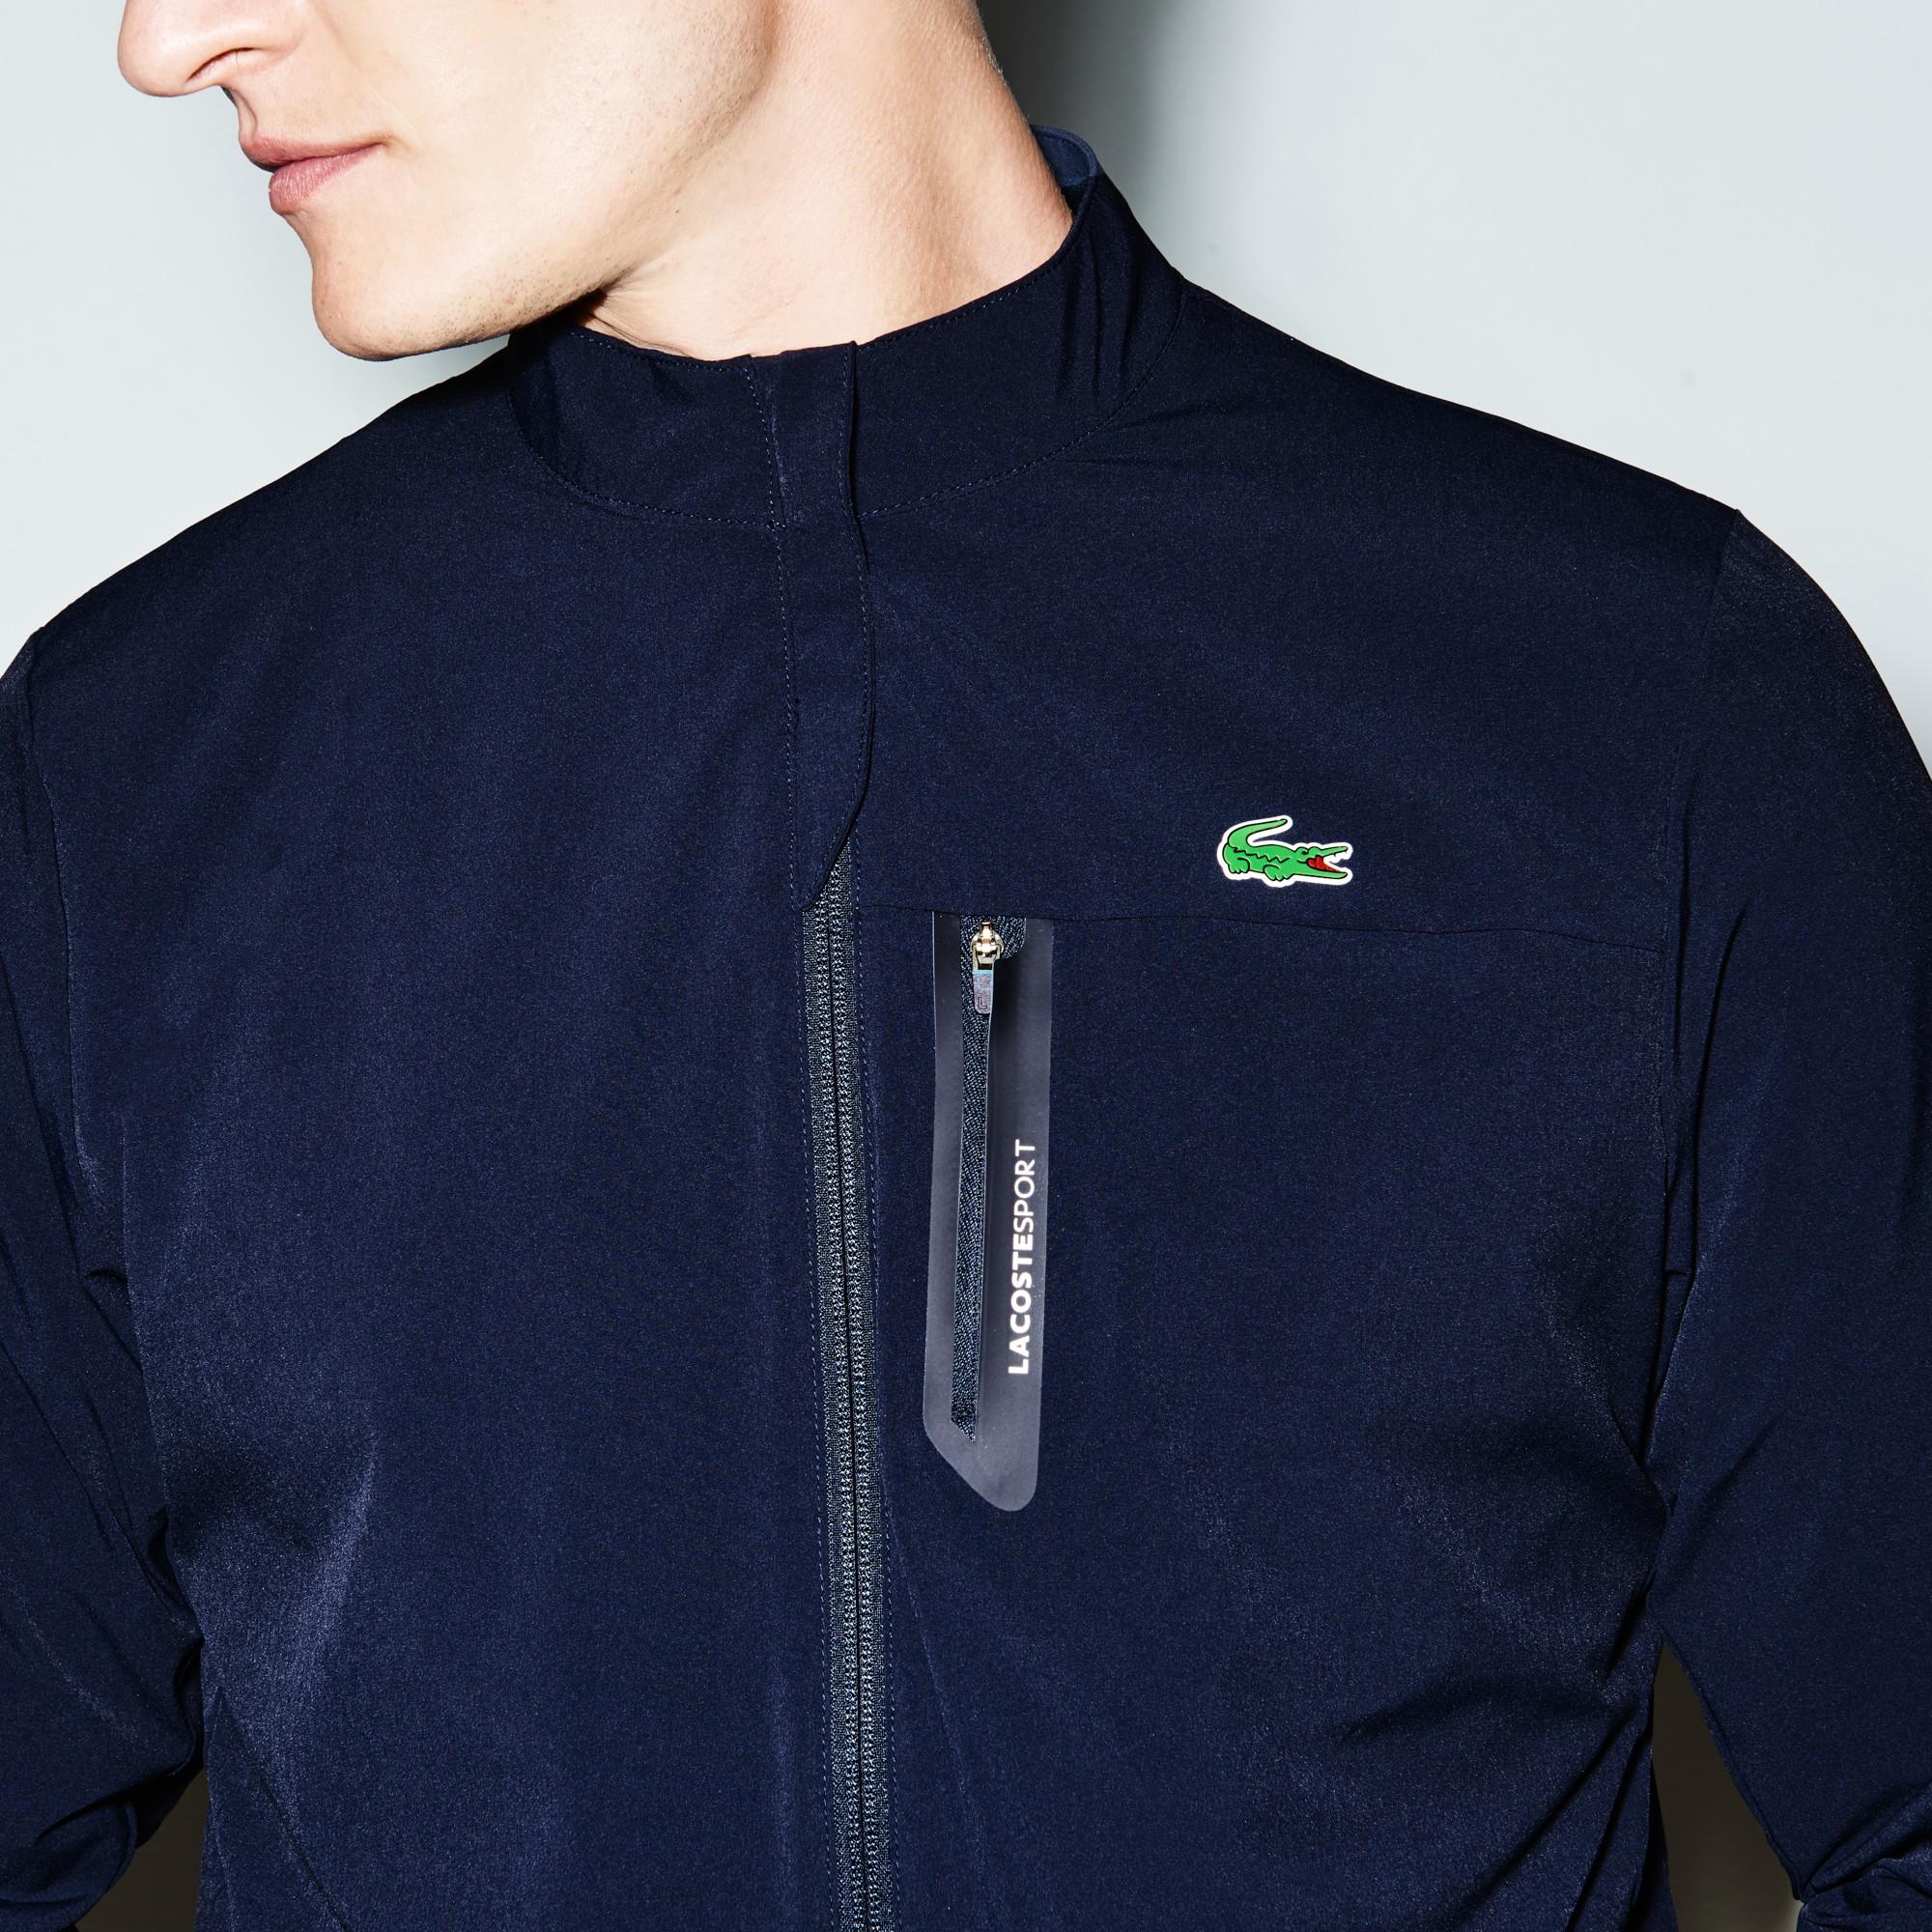 6c4050b5 Lacoste Men's Sport Technical Taffeta Zip Golf Jacket - Navy Blue/Navy Blue  Xxl Green